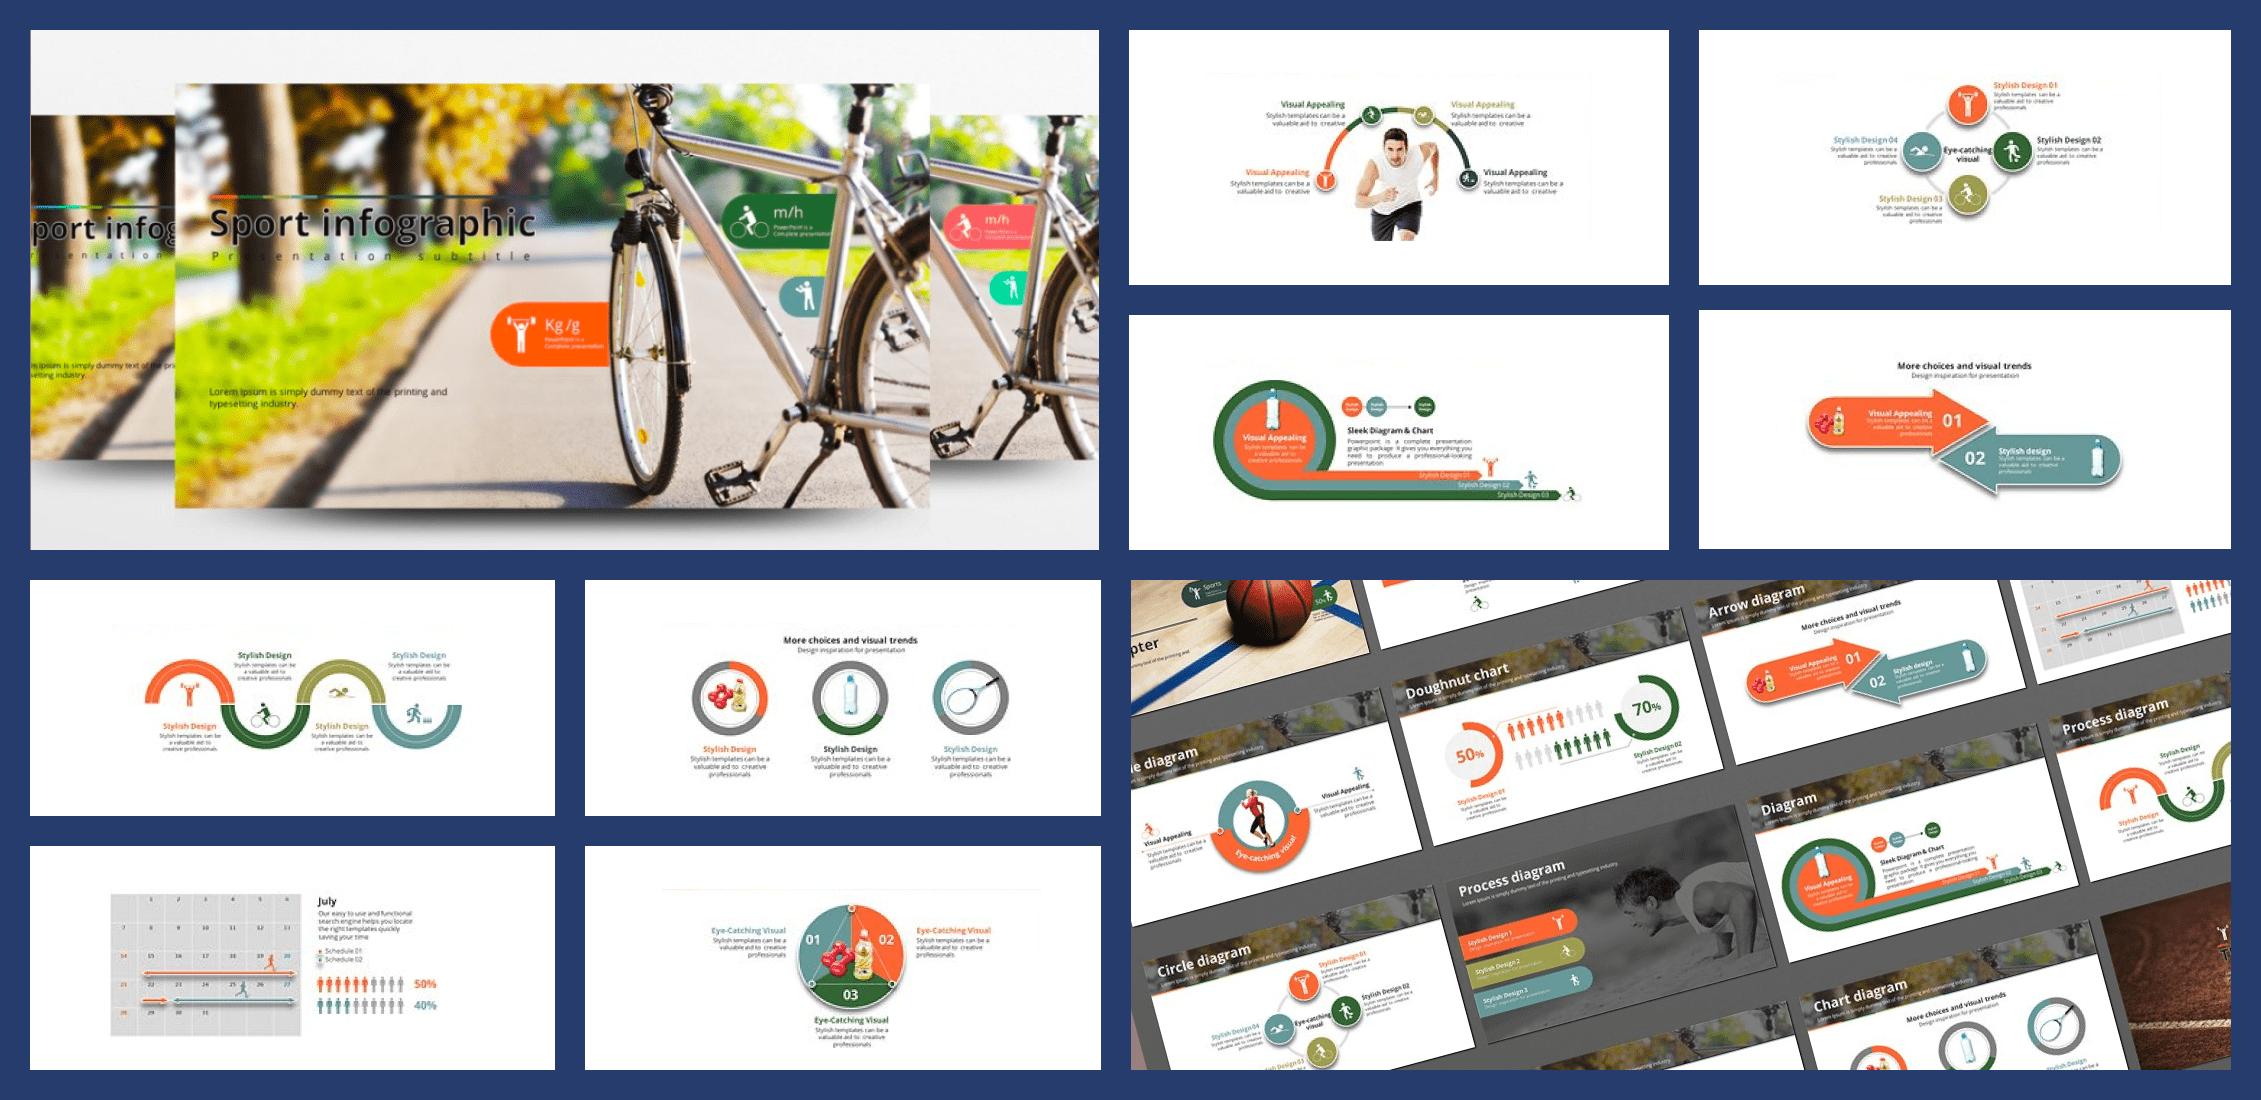 50+ Free and Premium Simple Google Slides Themes in 2021 - simple google slides theme 08